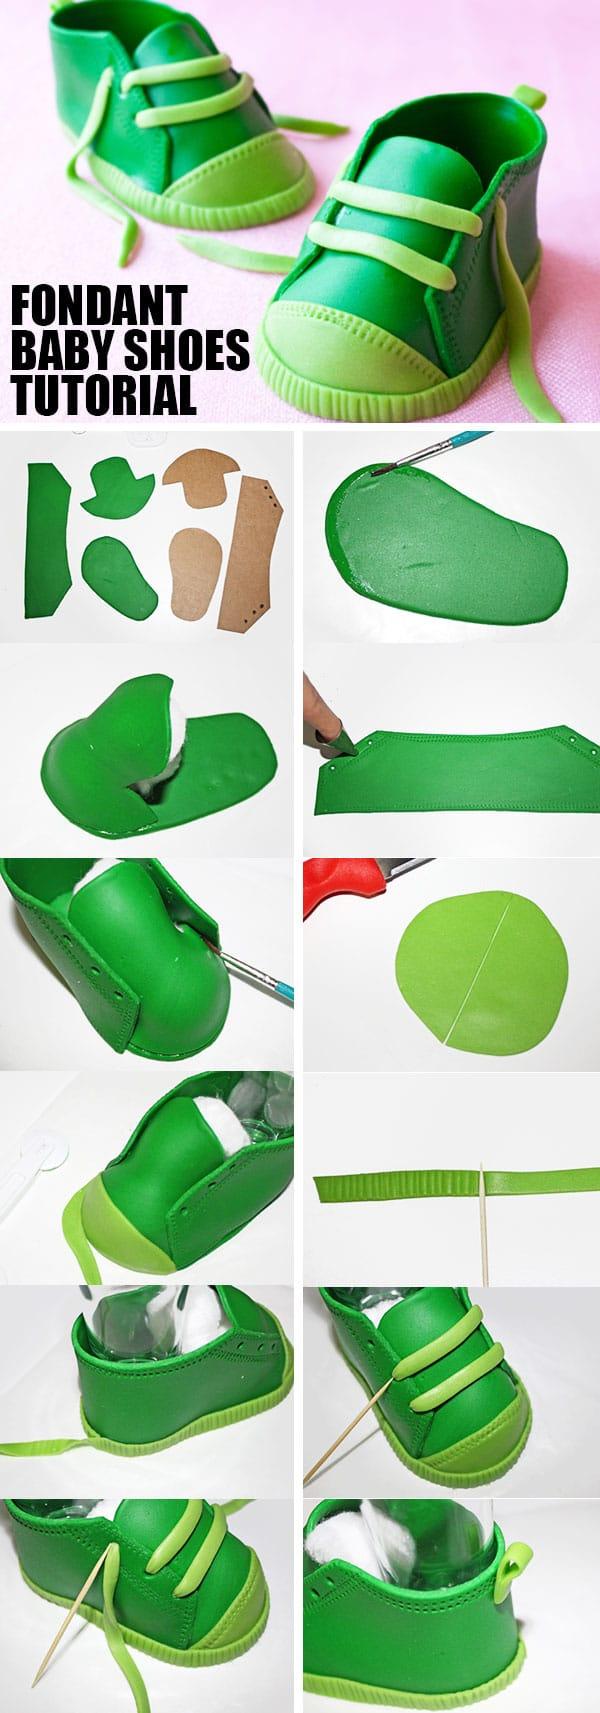 95f43a147e52 How to Make Fondant Baby Shoes - CakeWhiz